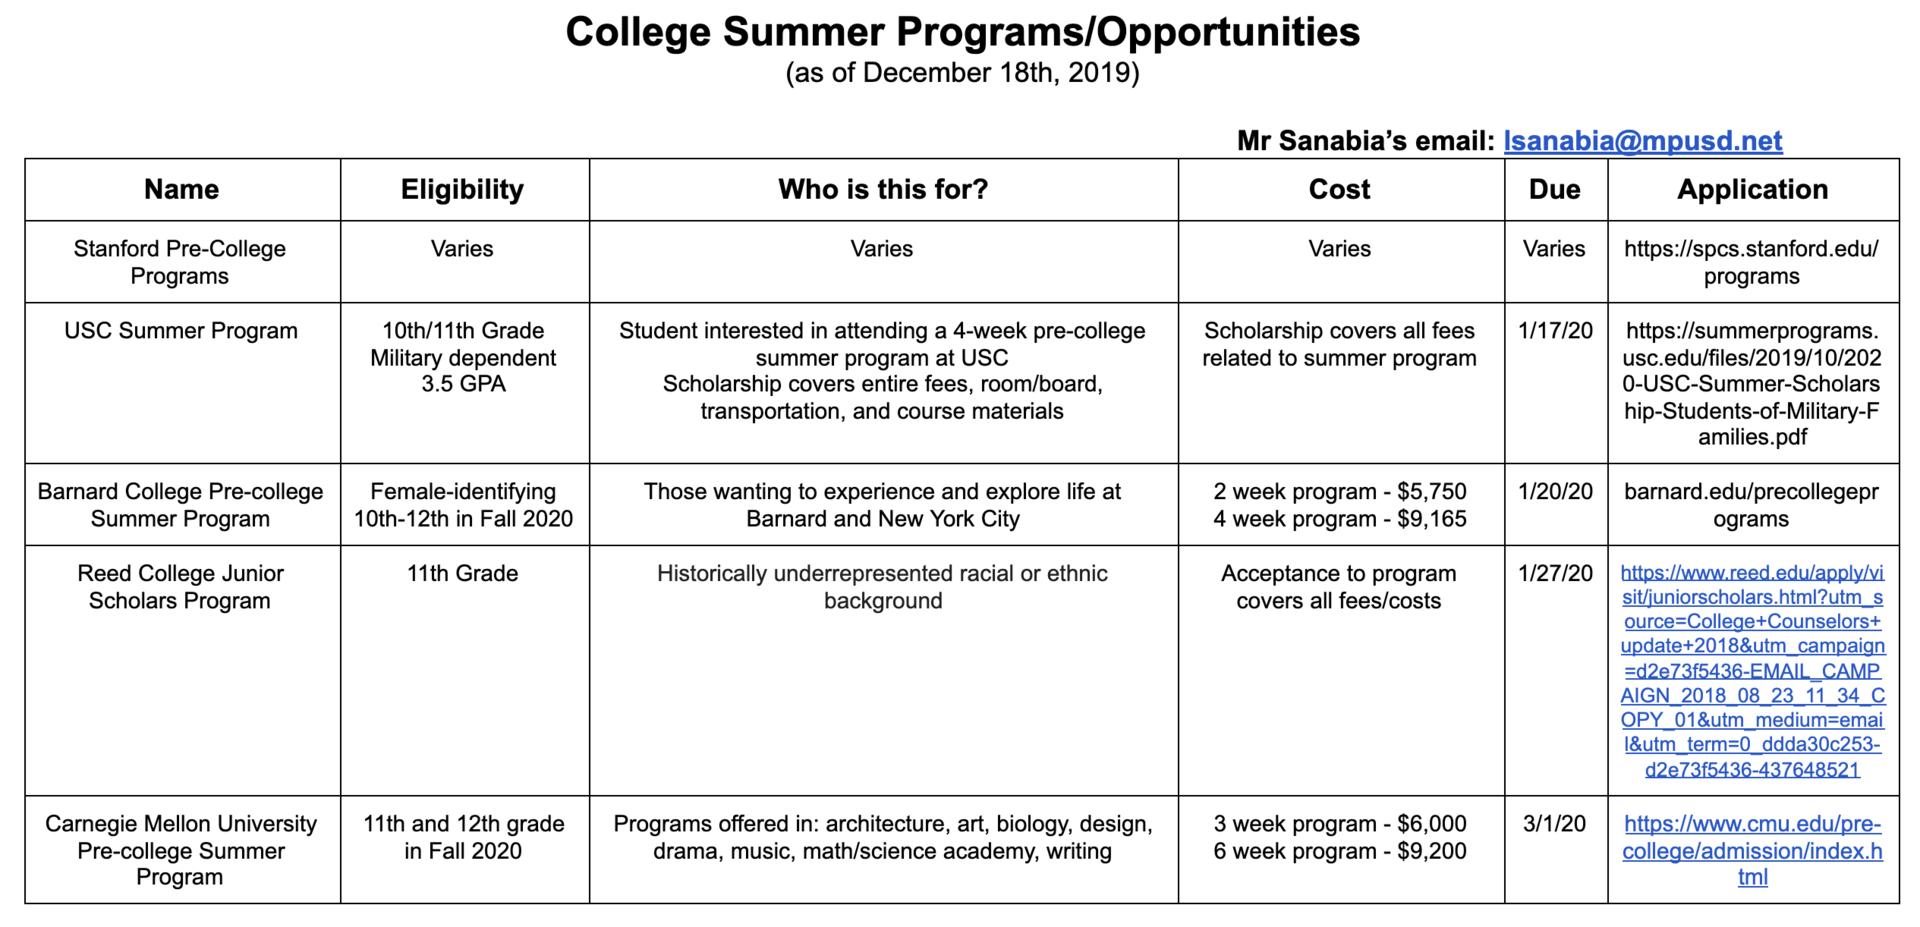 College Summer Programs